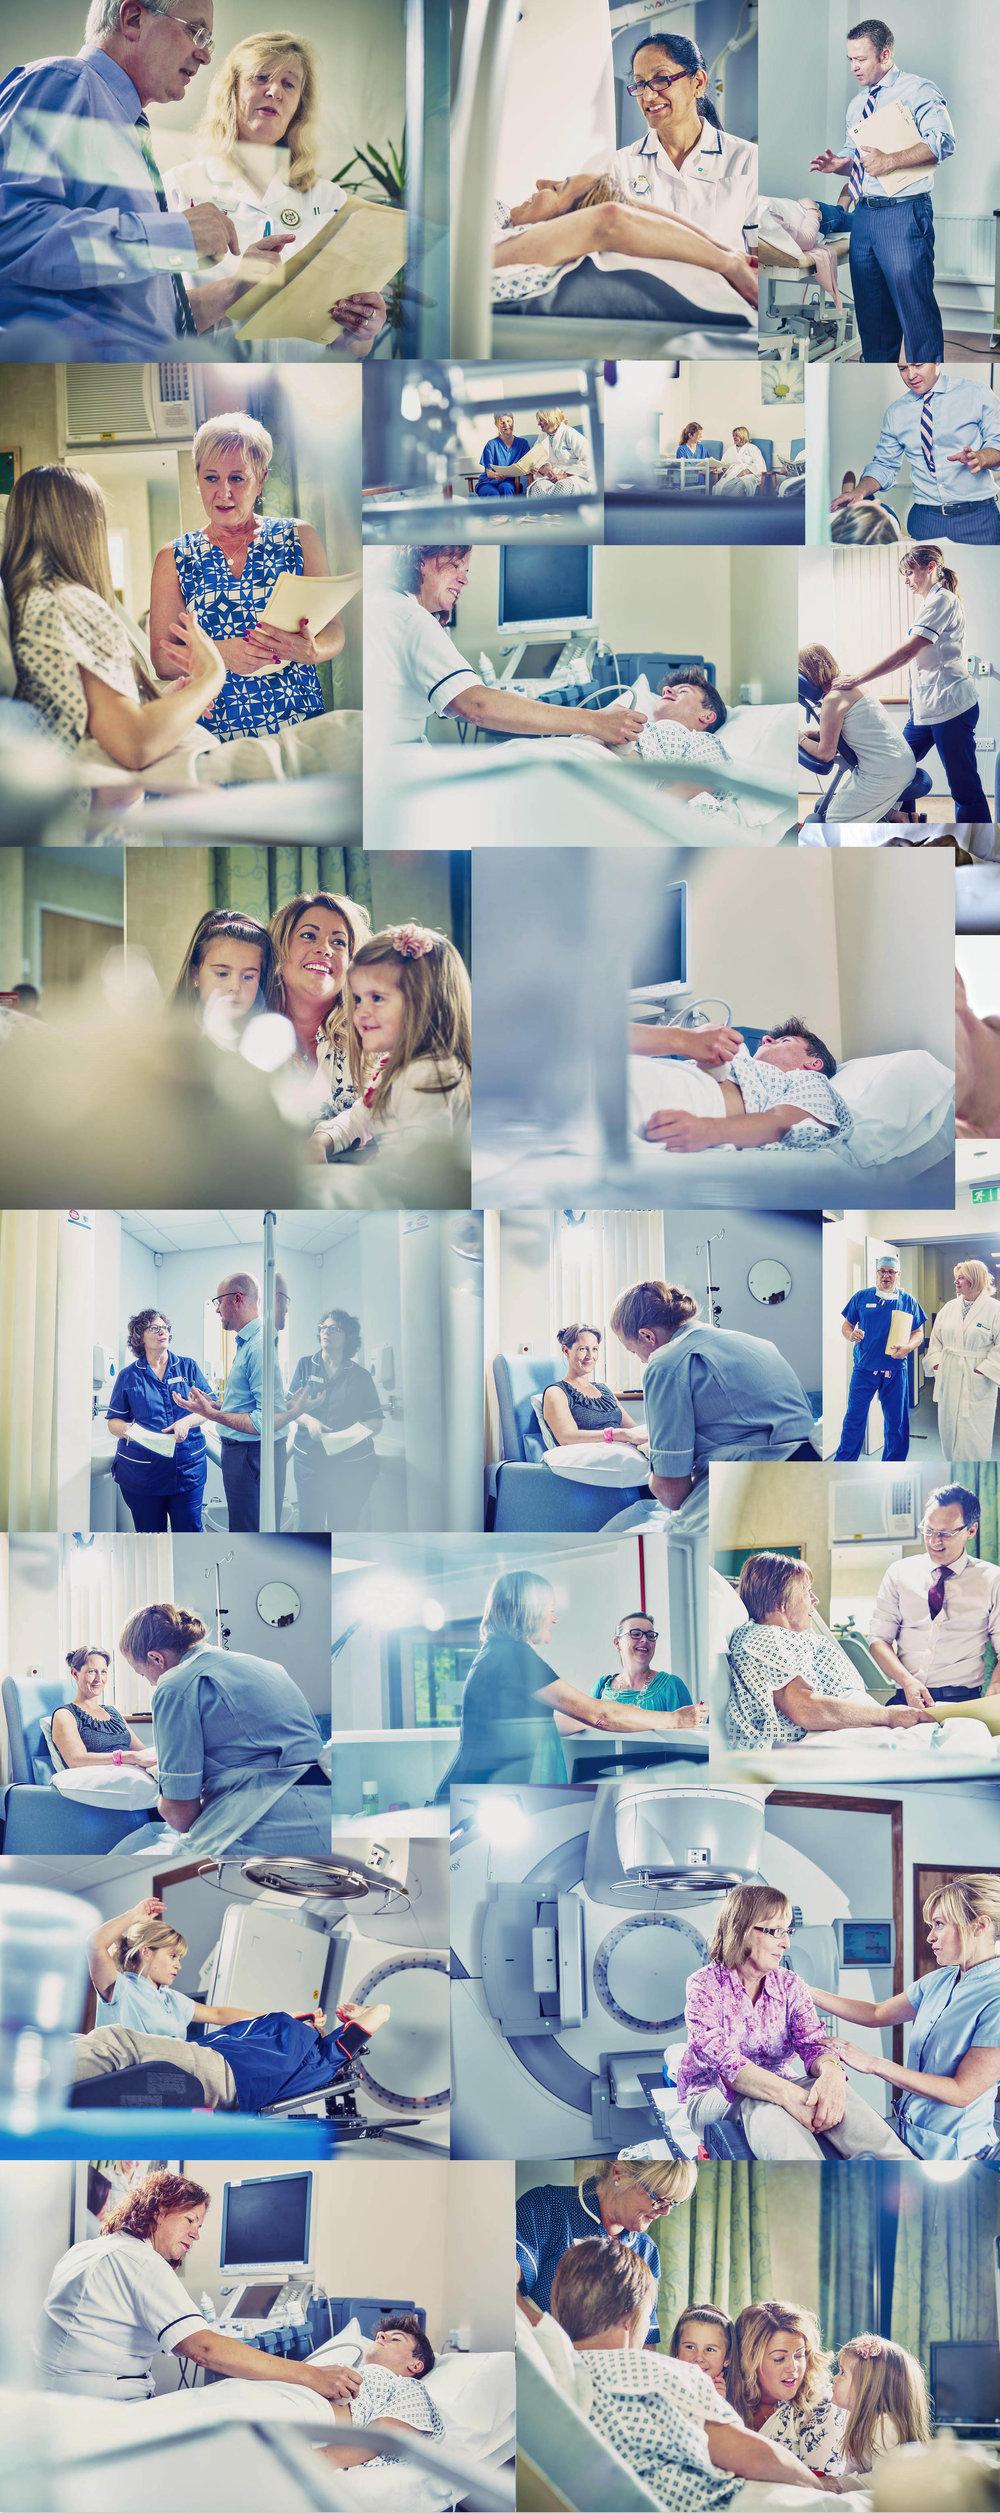 BMI-work-park-hospital.jpg